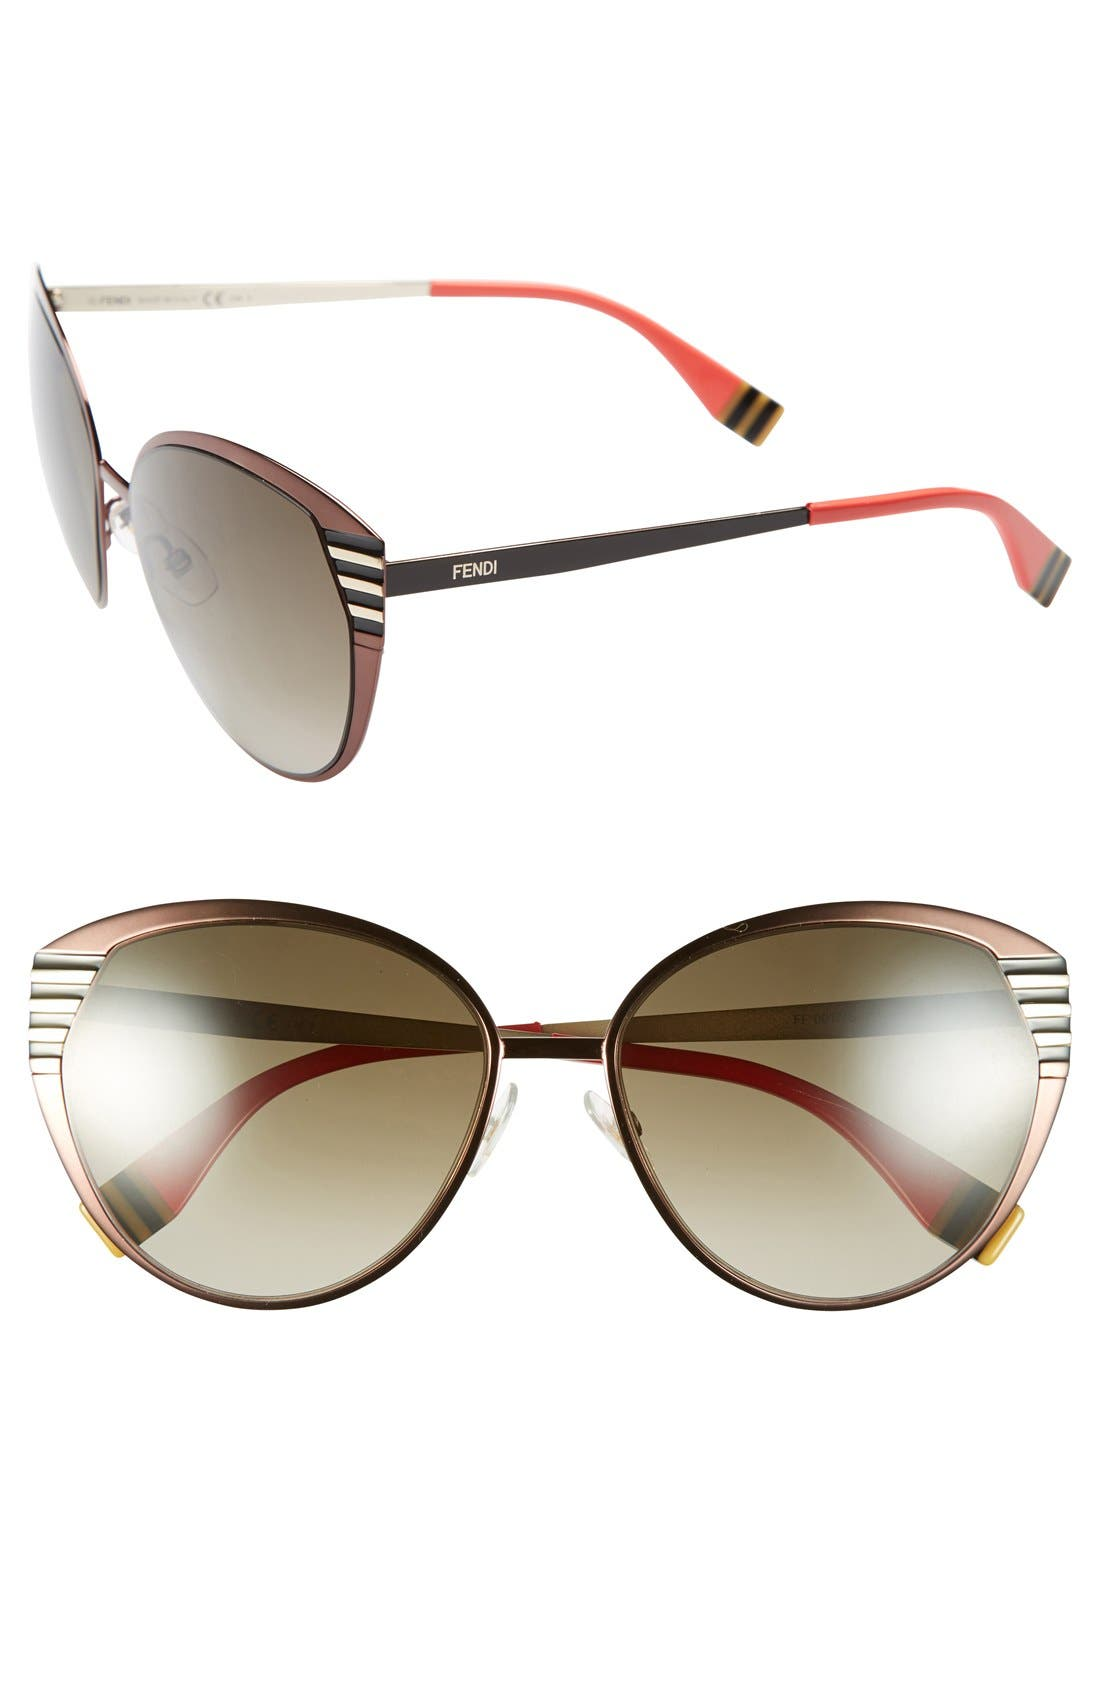 Main Image - Fendi 57mm Oversized Sunglasses